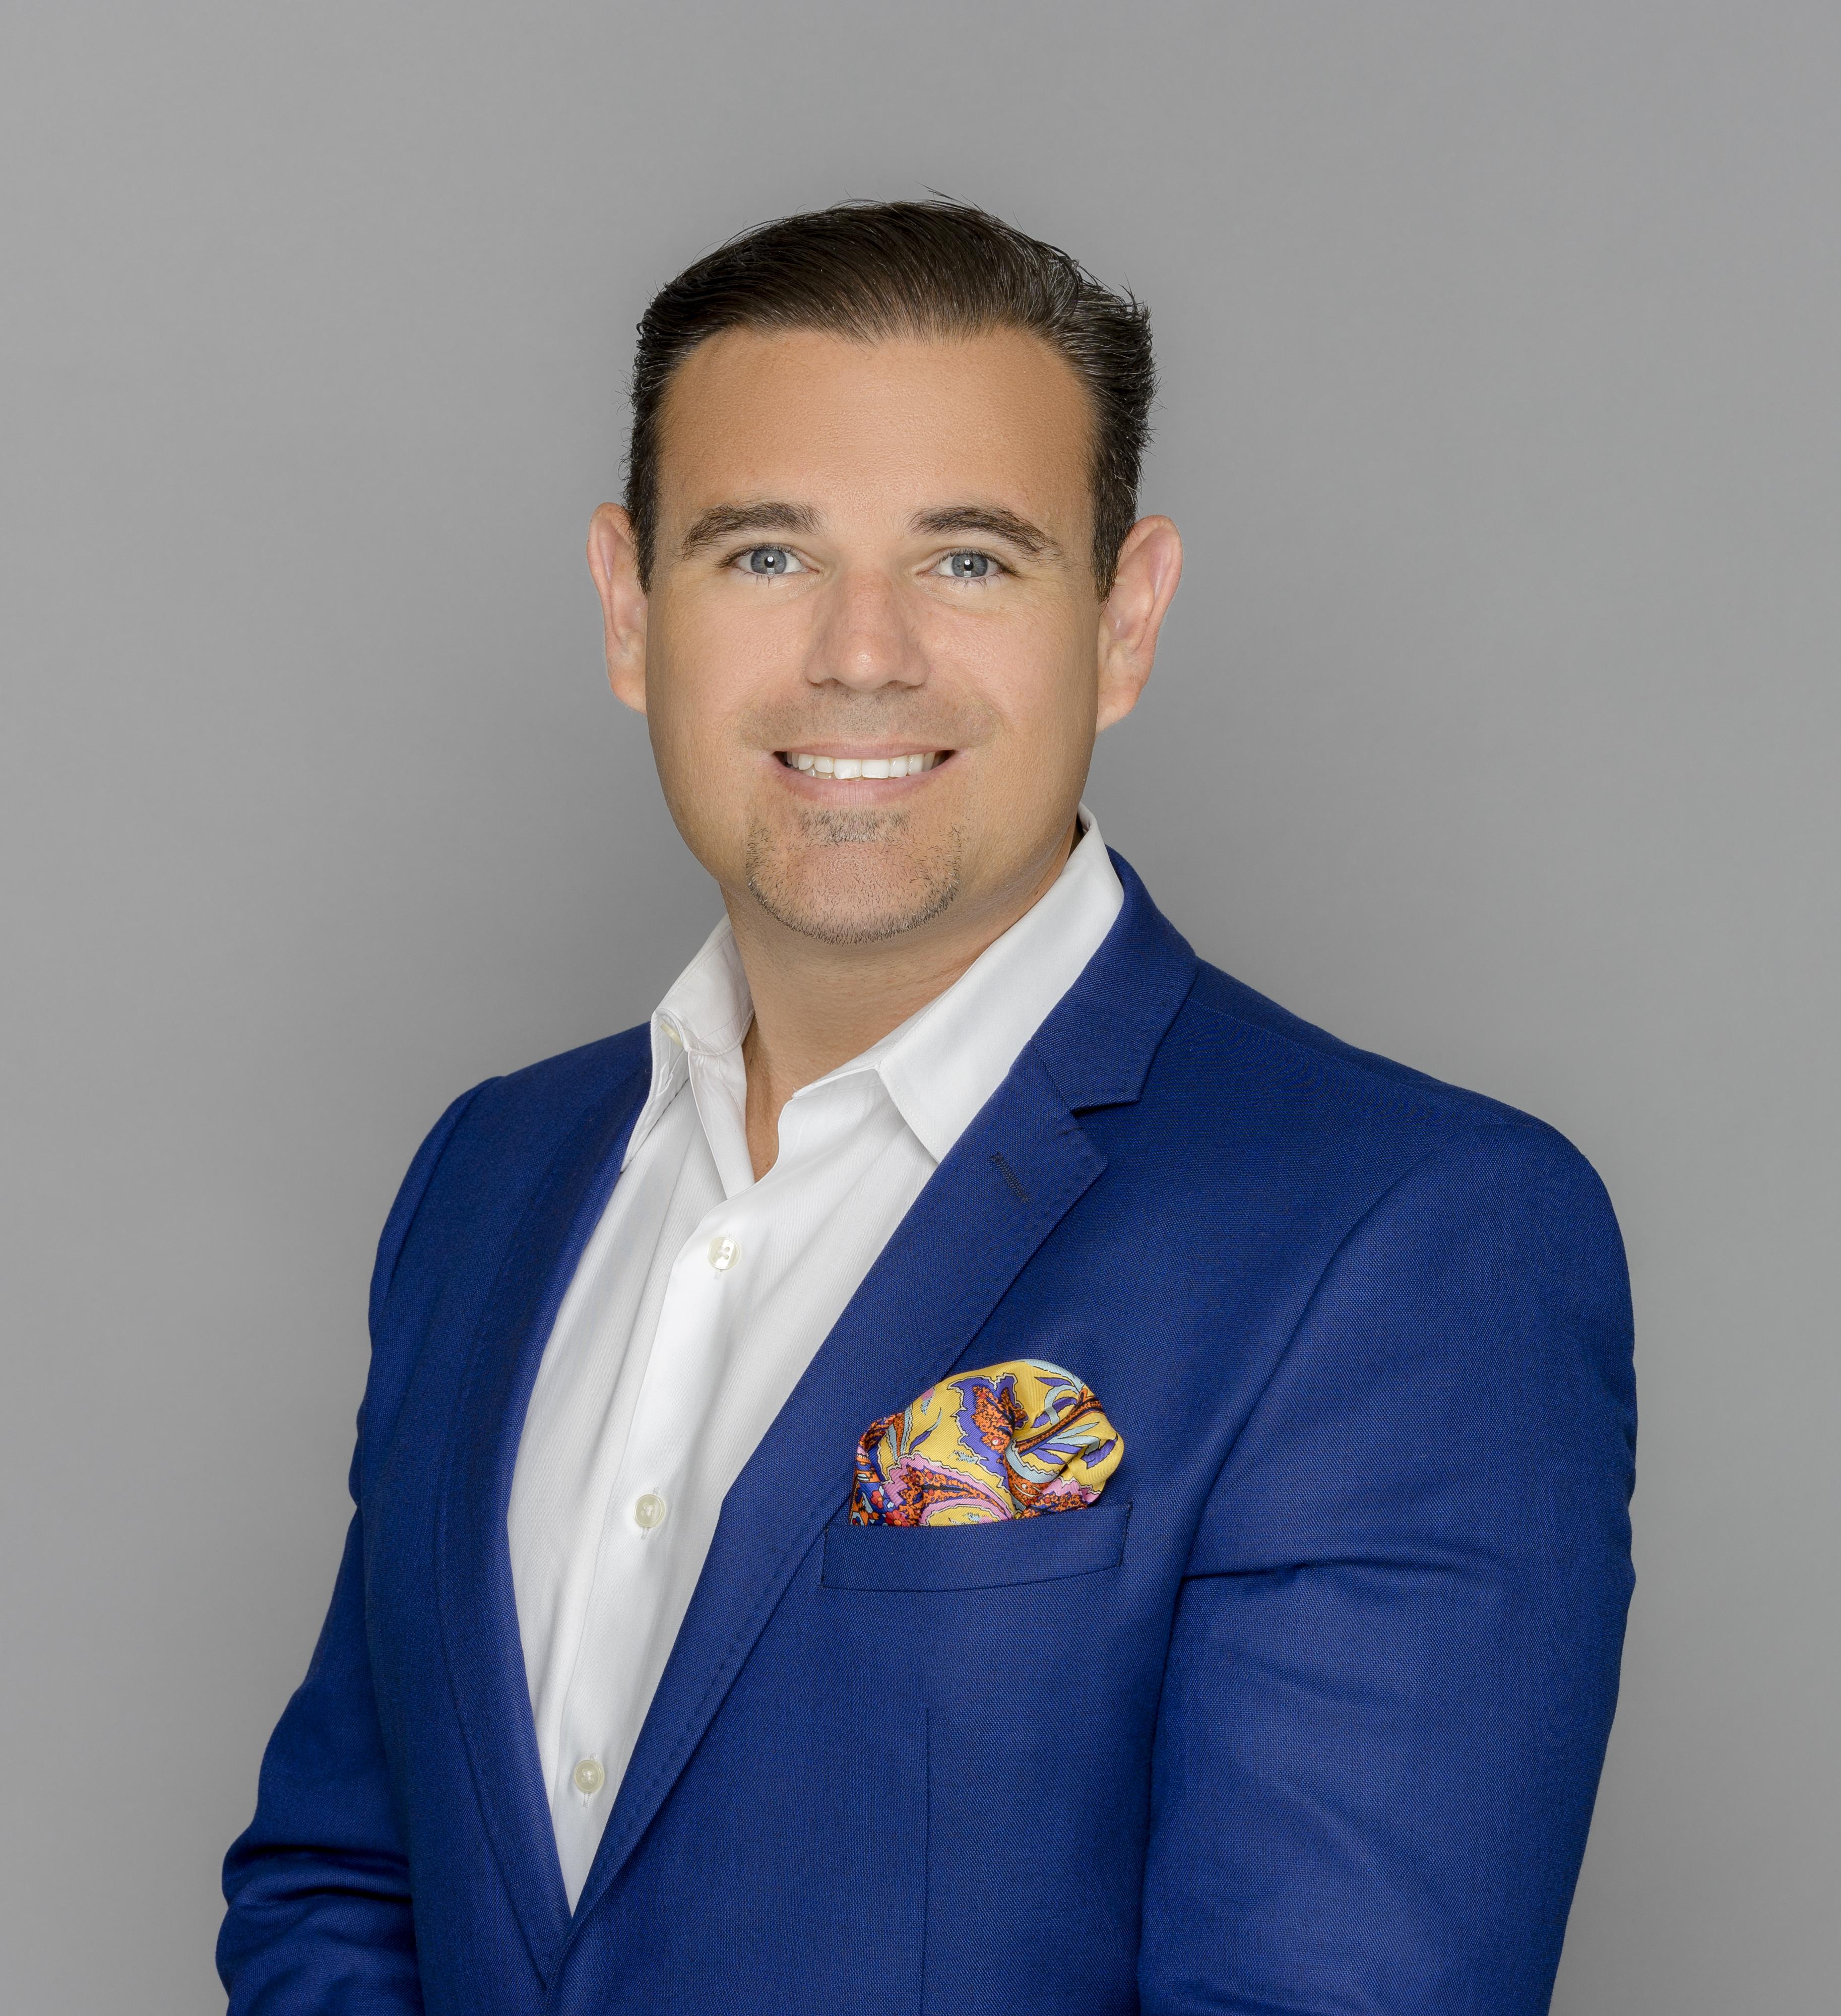 Michael Baquiran, Real Estate Agent - Yorba Linda, CA